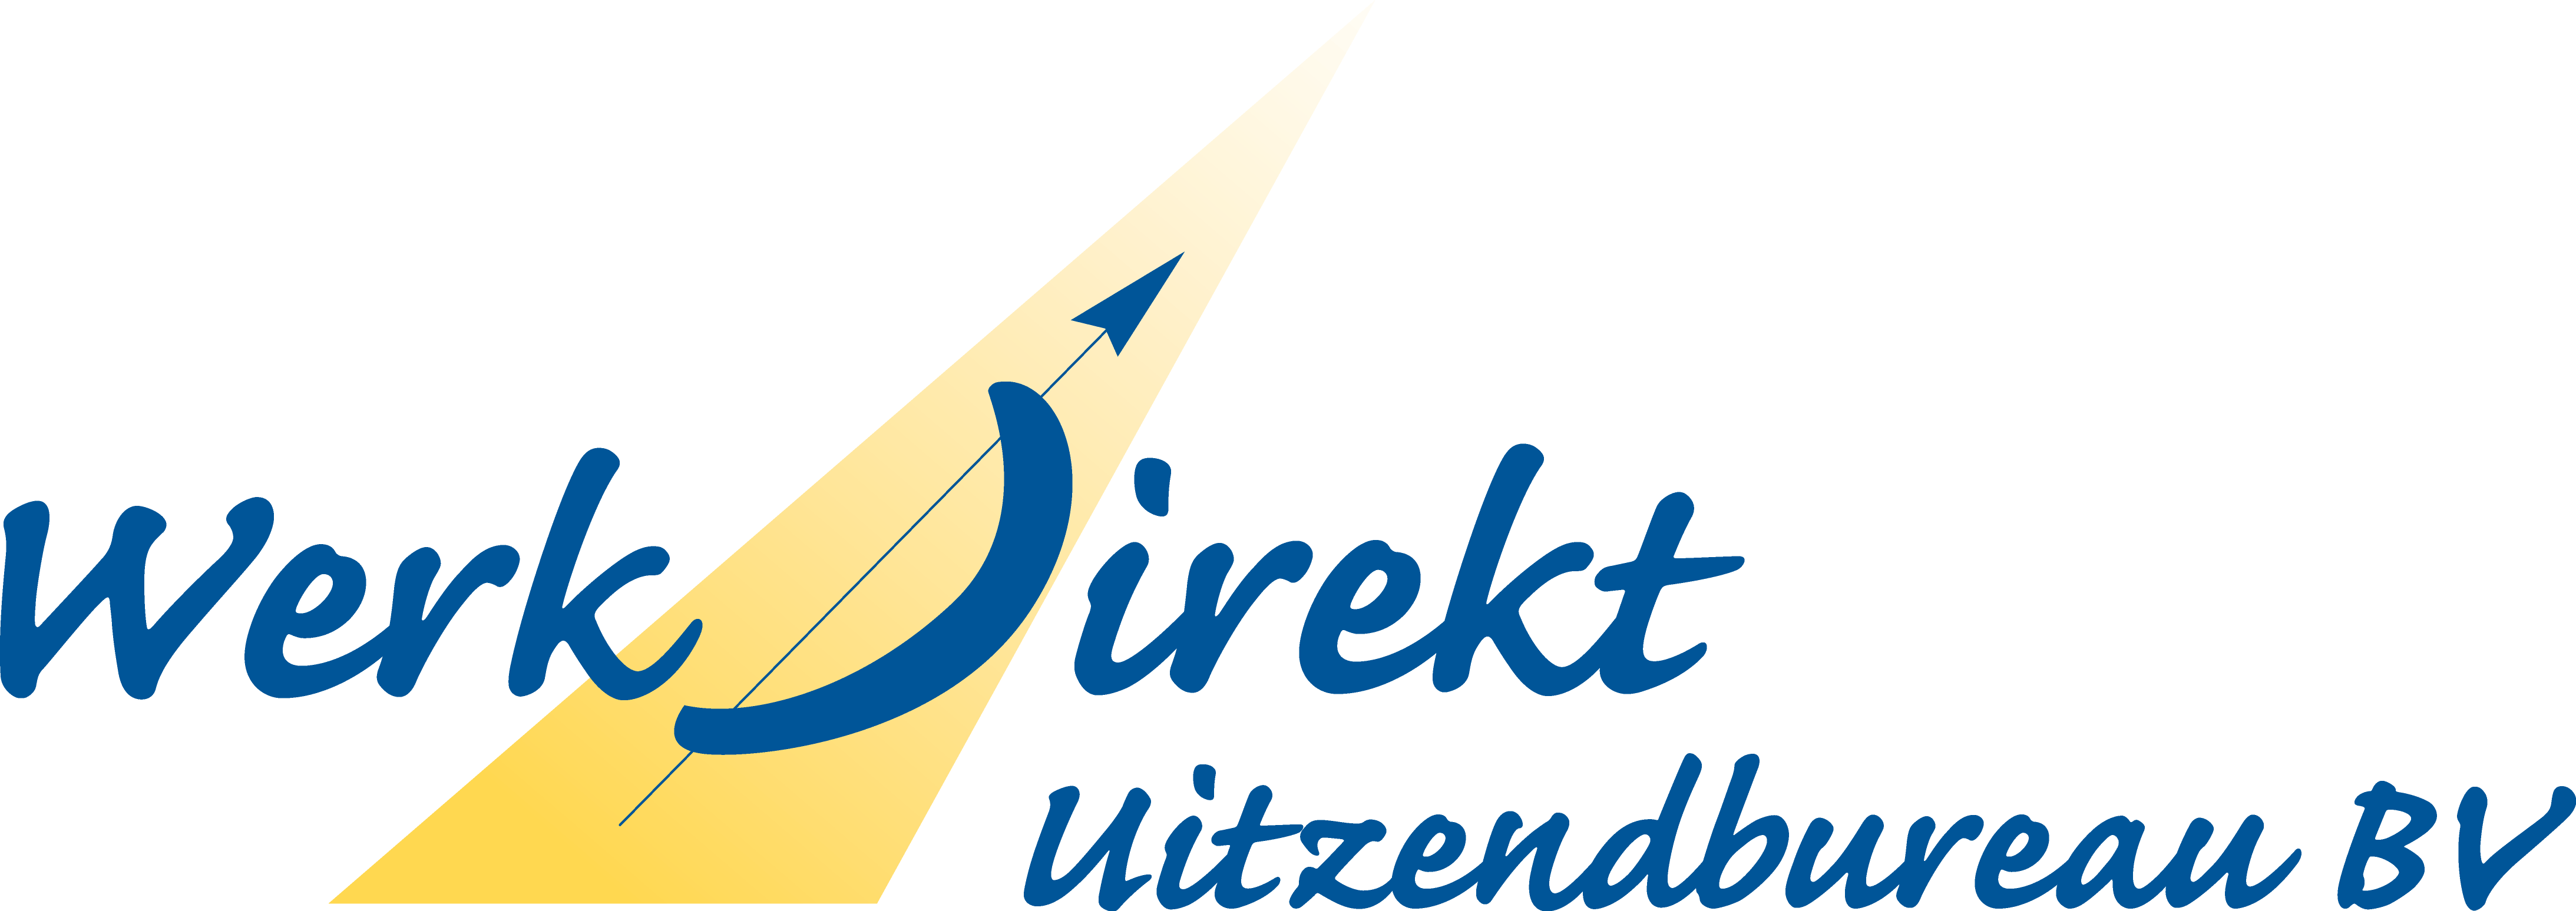 logo van werkdirekt